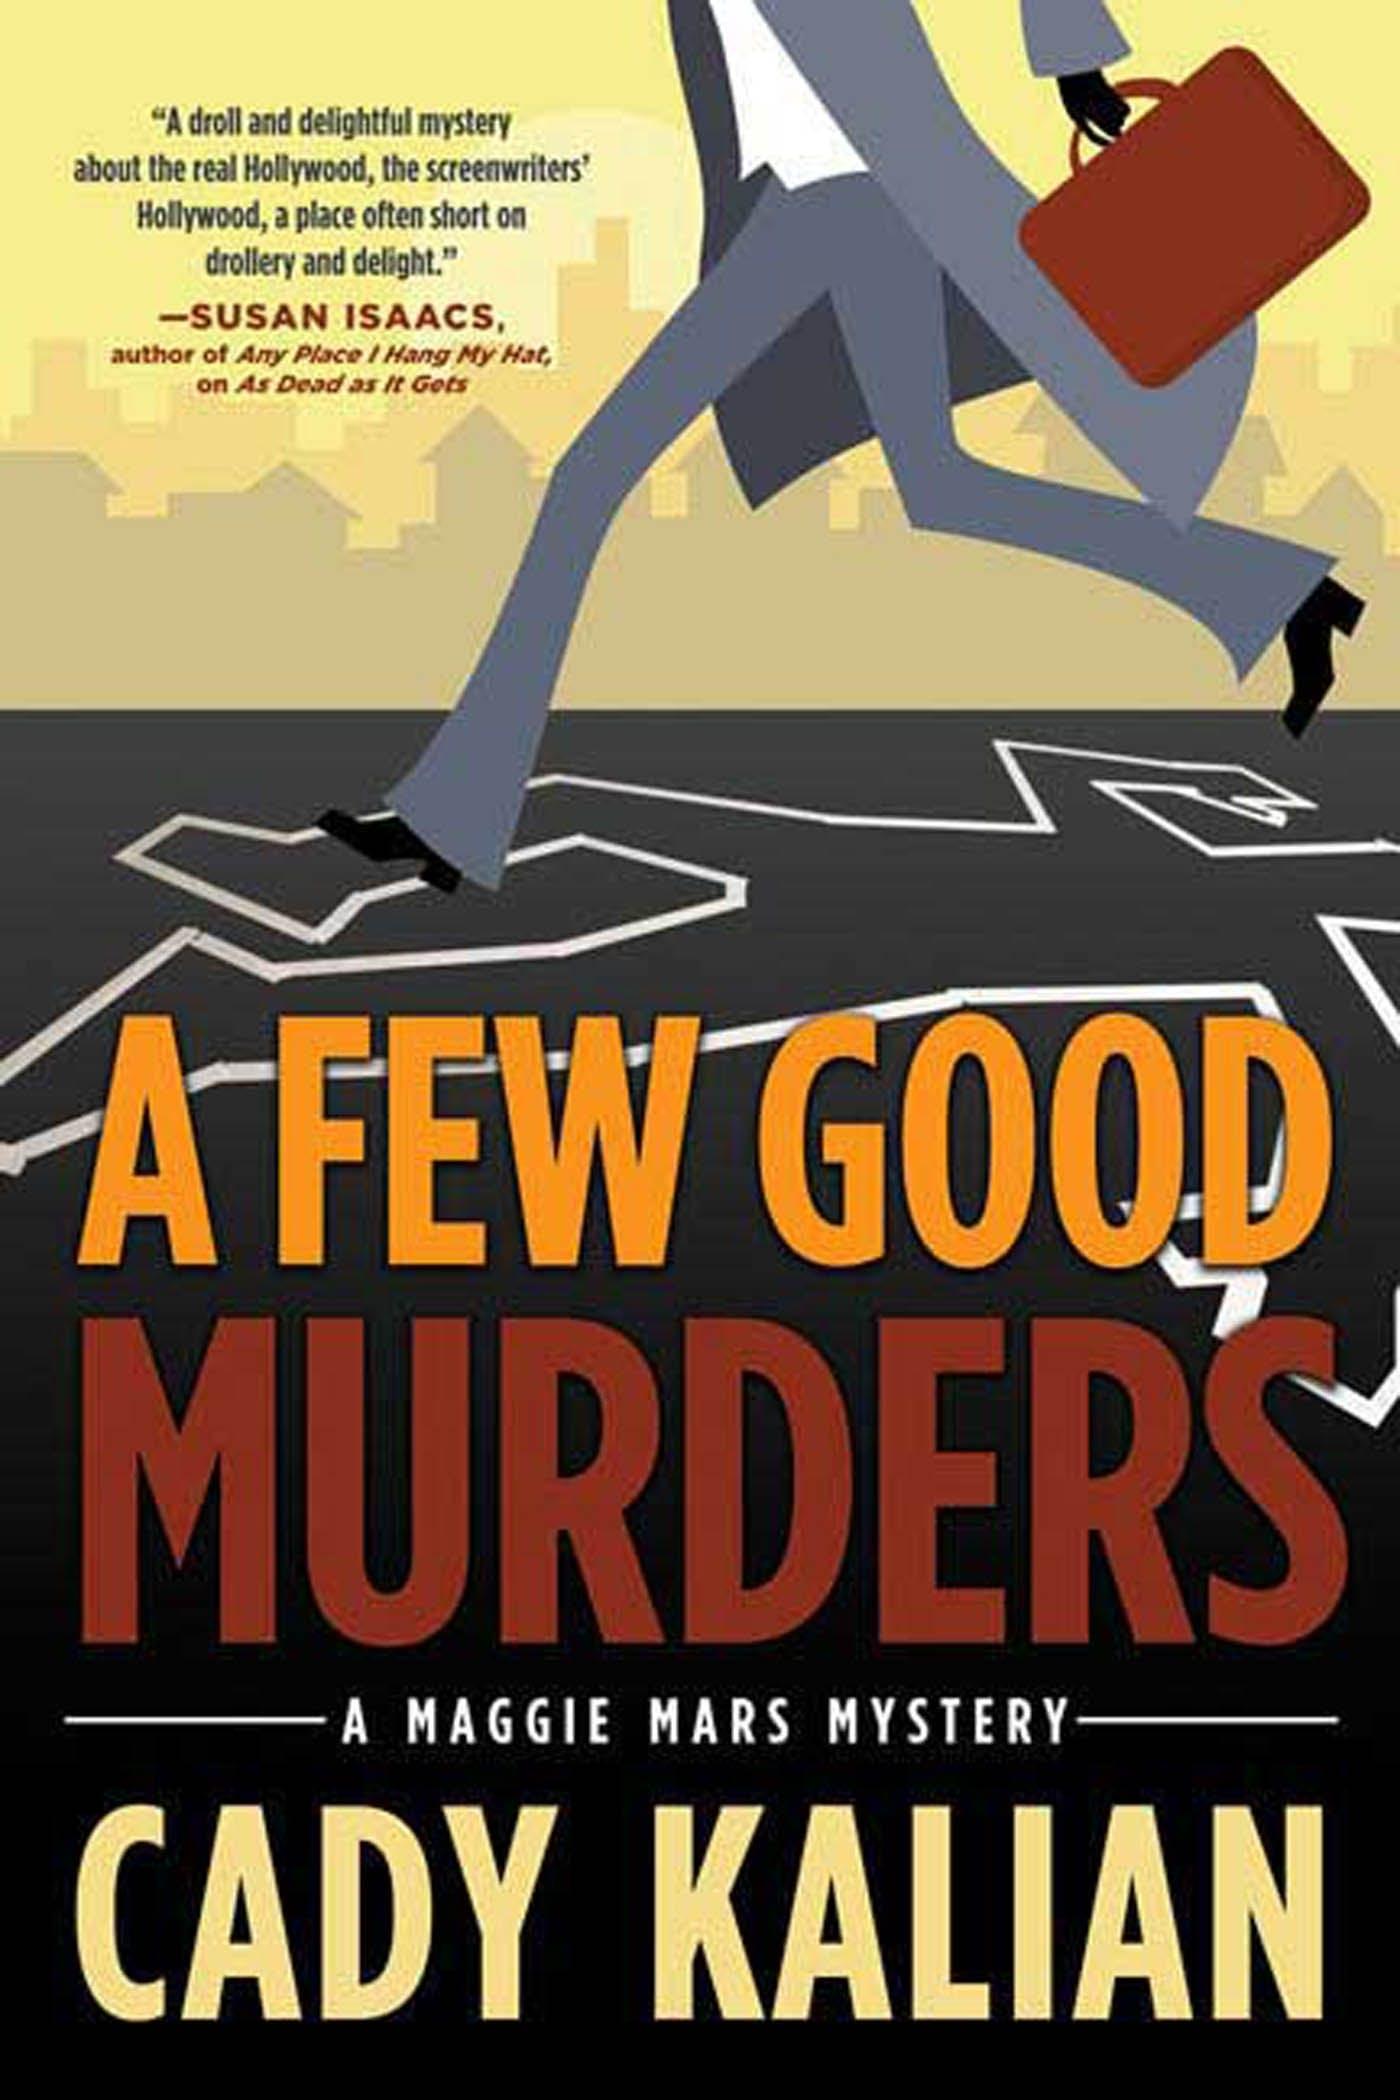 Image of A Few Good Murders